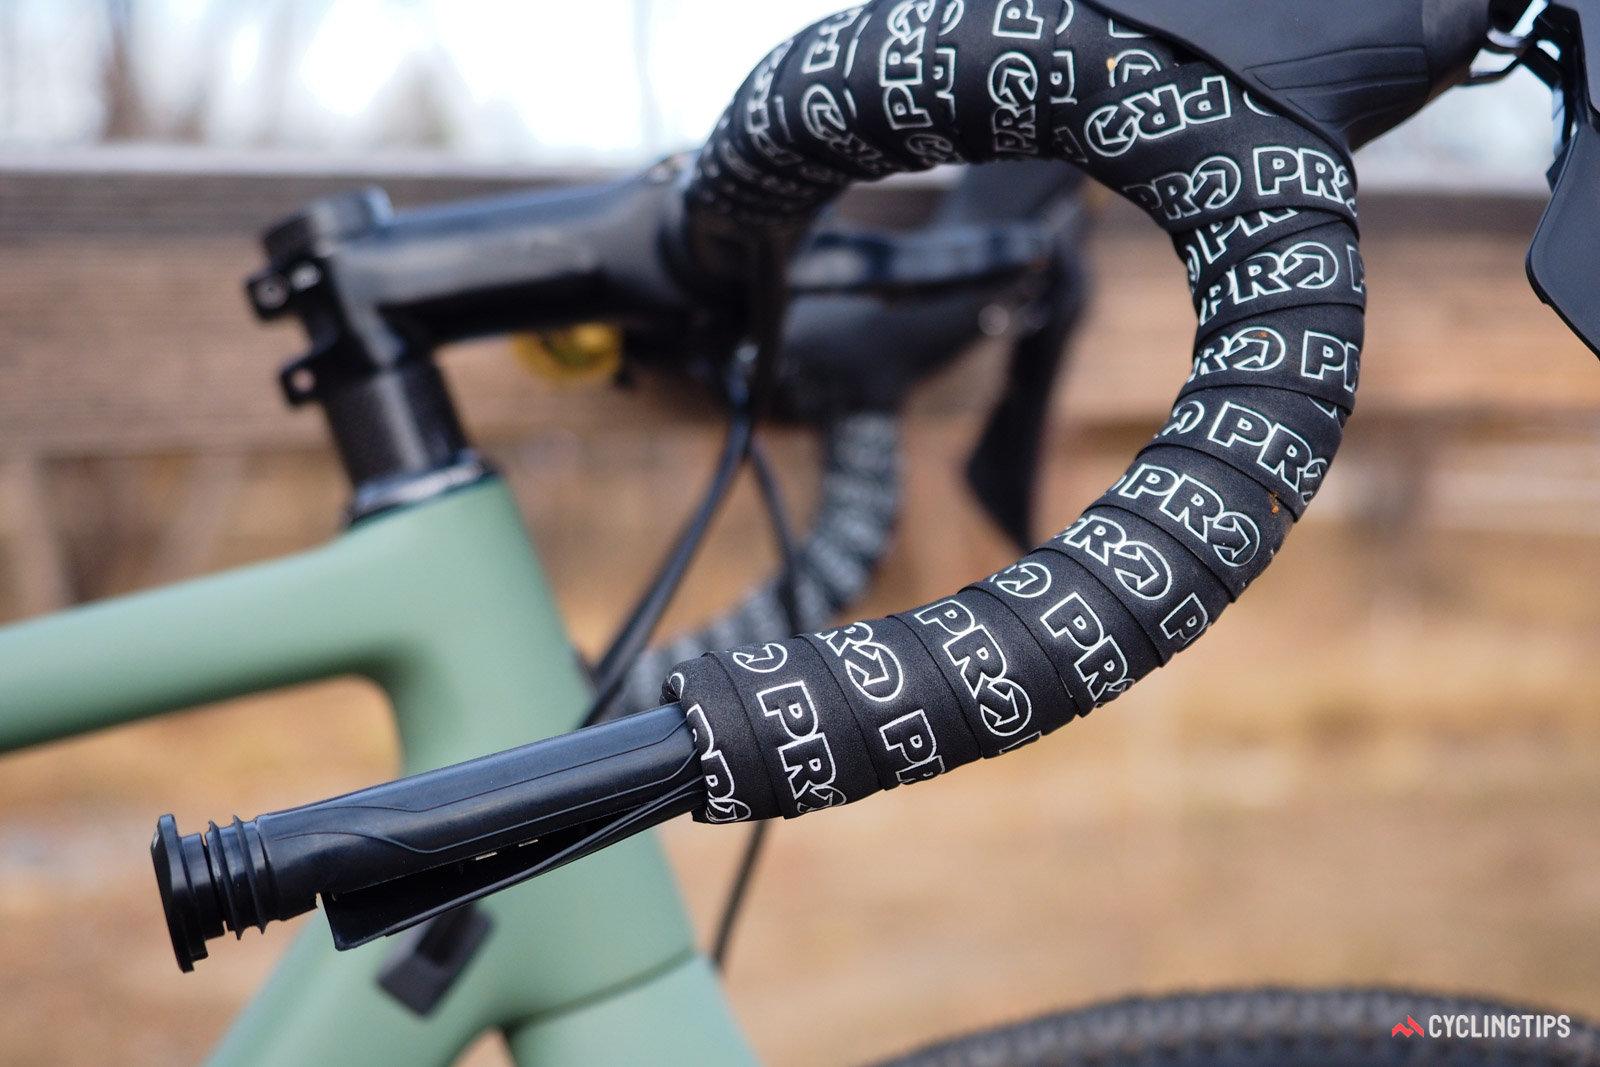 tappi manubrio multitool e kit riparazione tubeless bar kit one Wolftooth bici a